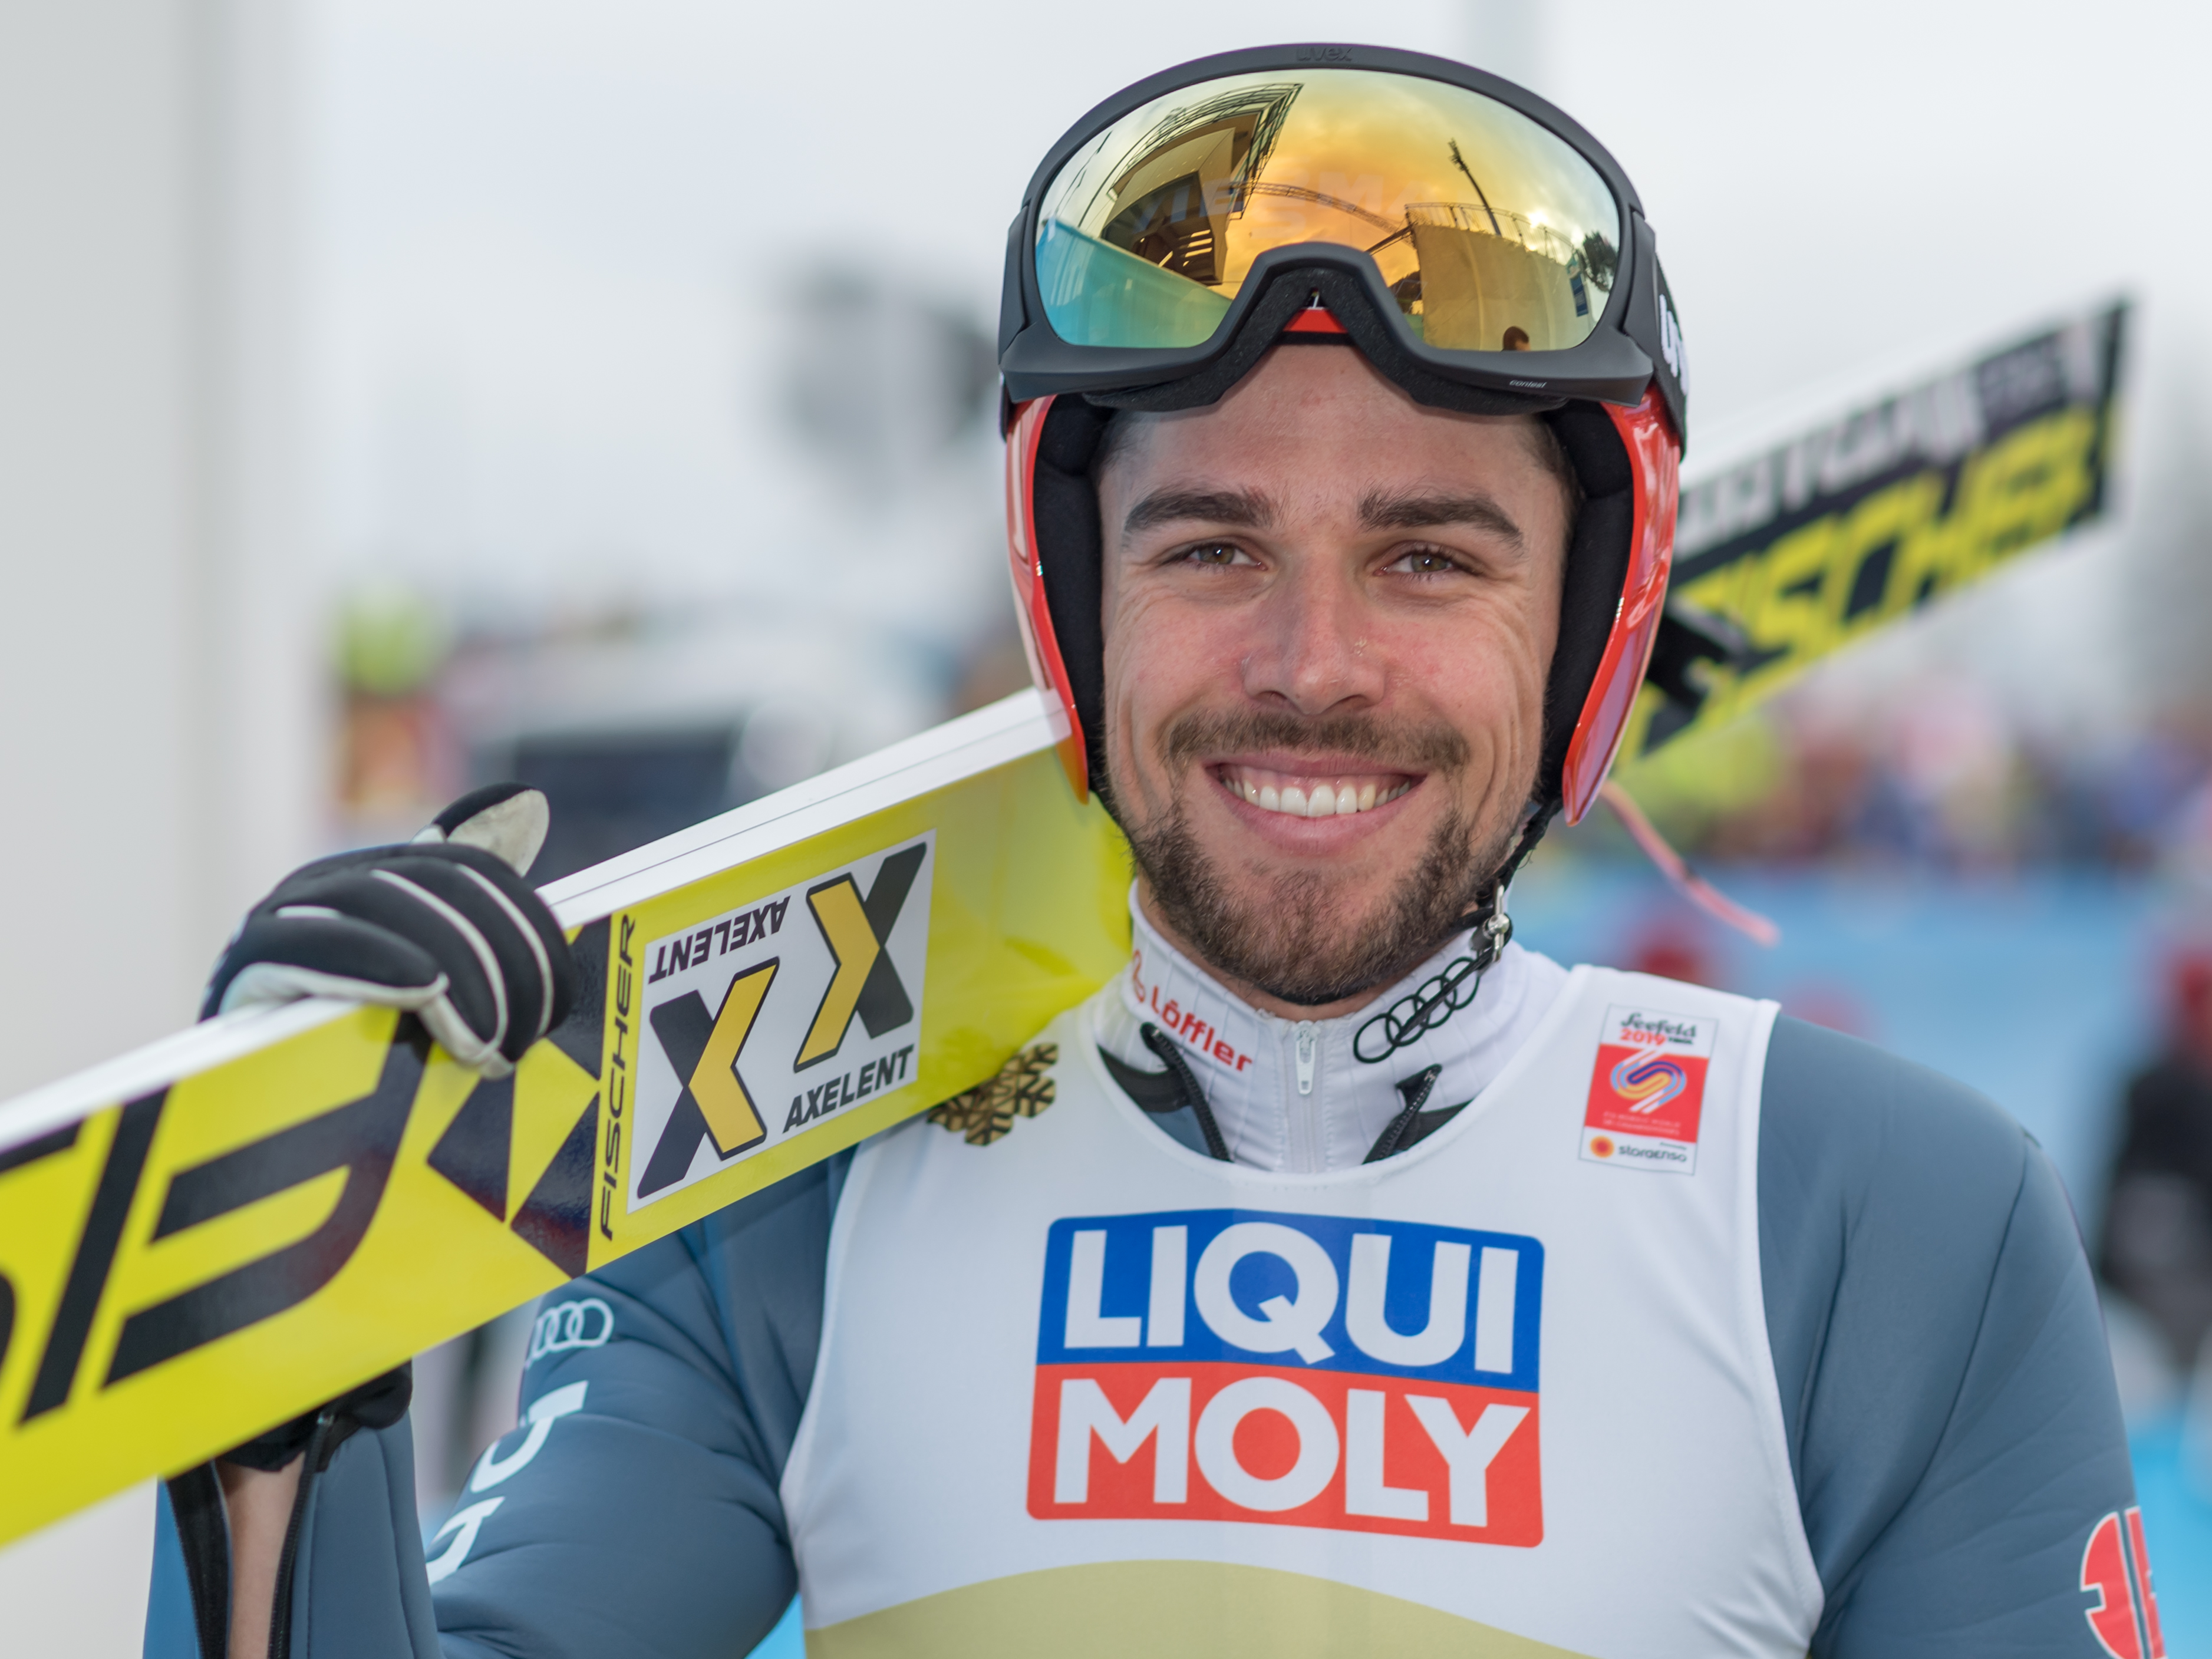 2020 Nordic Combined World Cup Winner Predictions prefer Rydzek